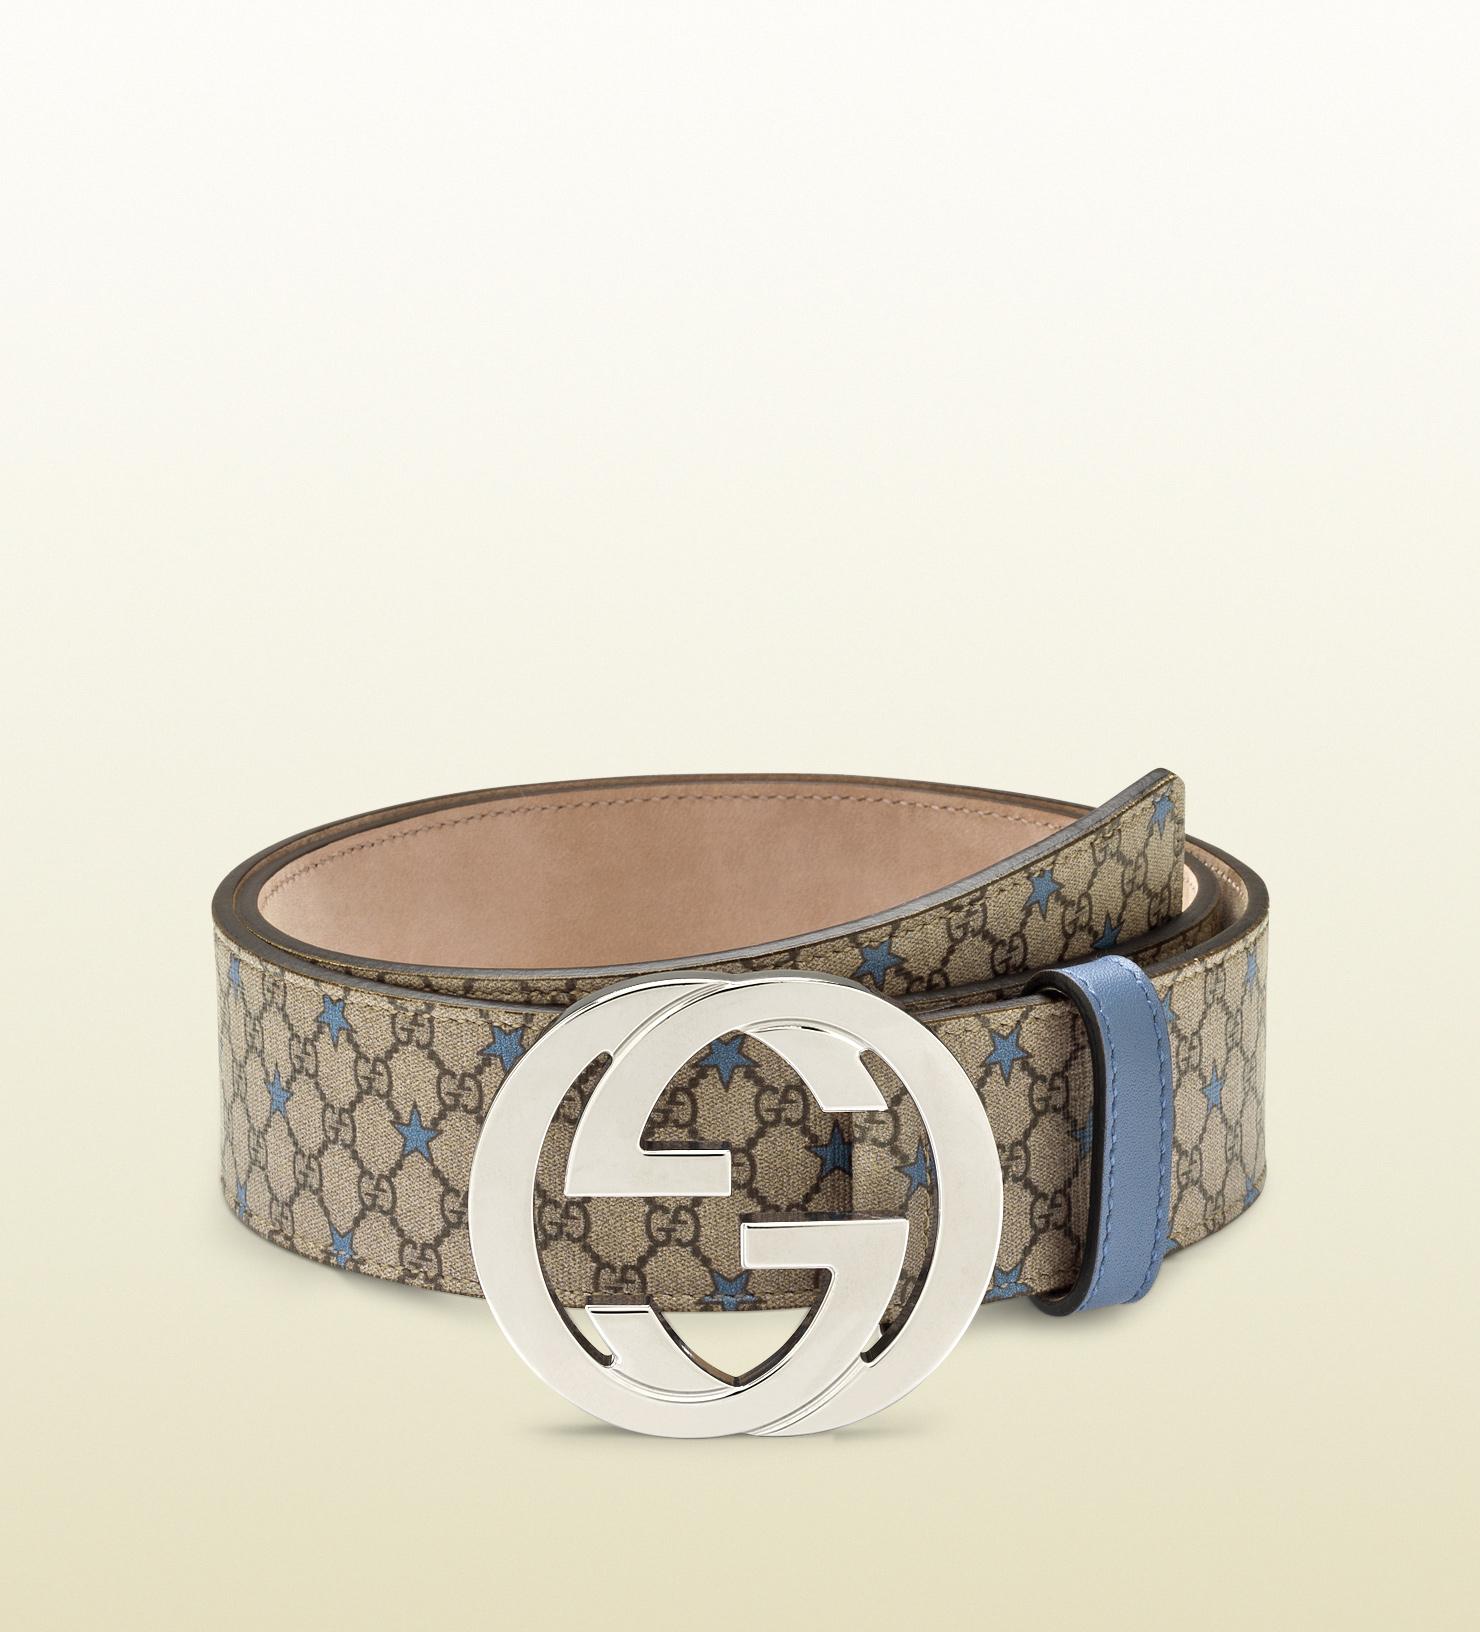 e383373dd Gucci Gg Supreme Canvas Belt with Interlocking G Buckle in Natural ...